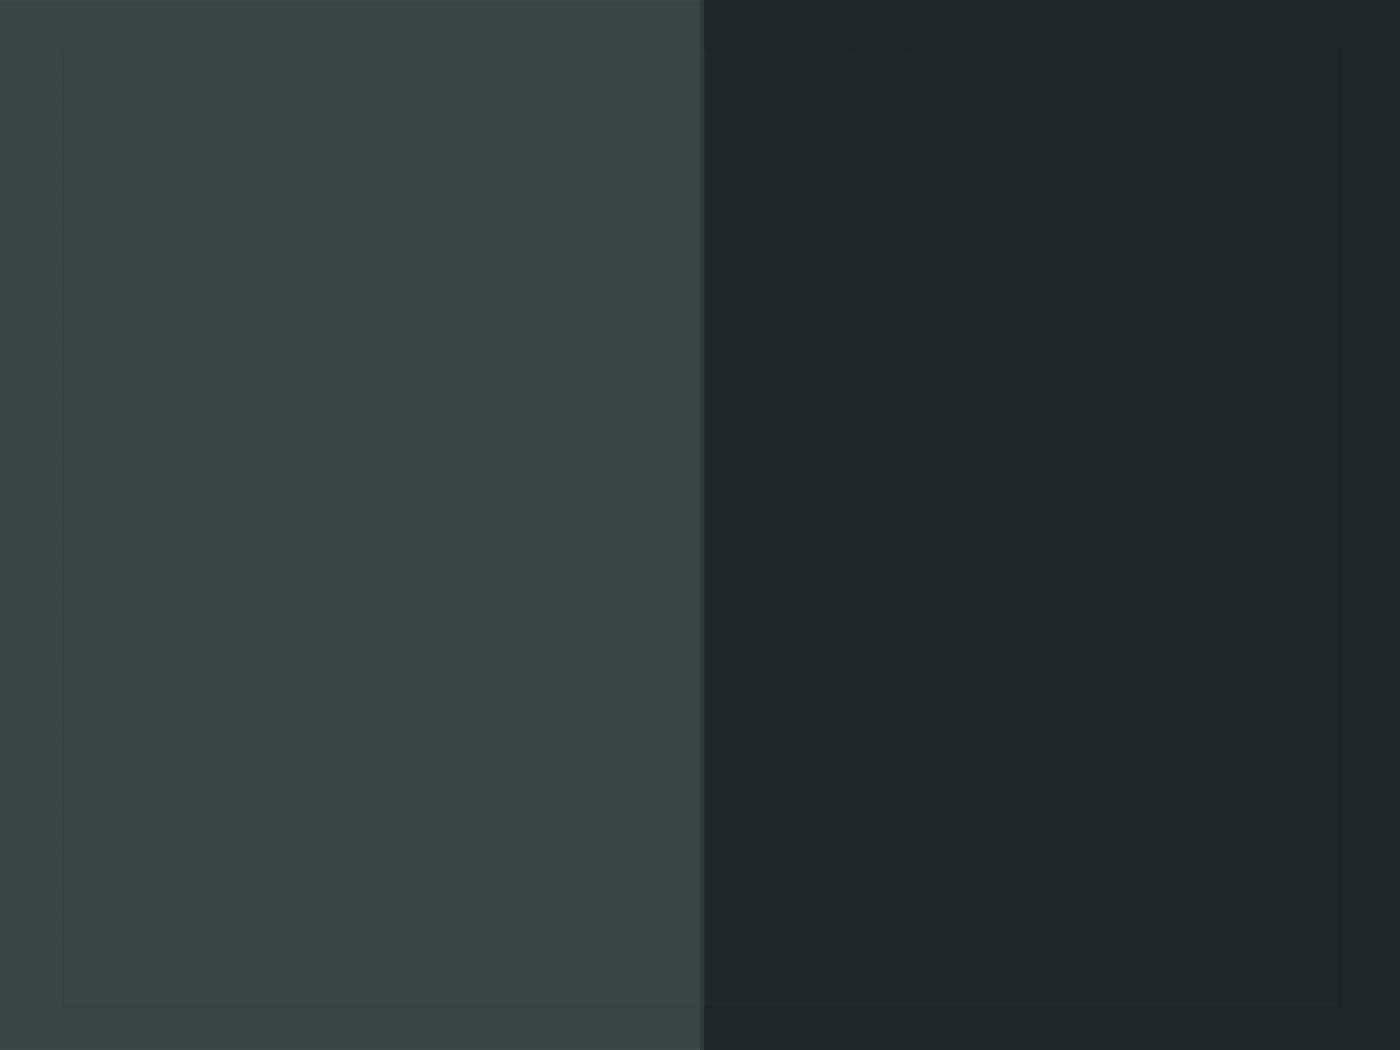 Dark Grey//Medium Grey Showcard 30 x 40